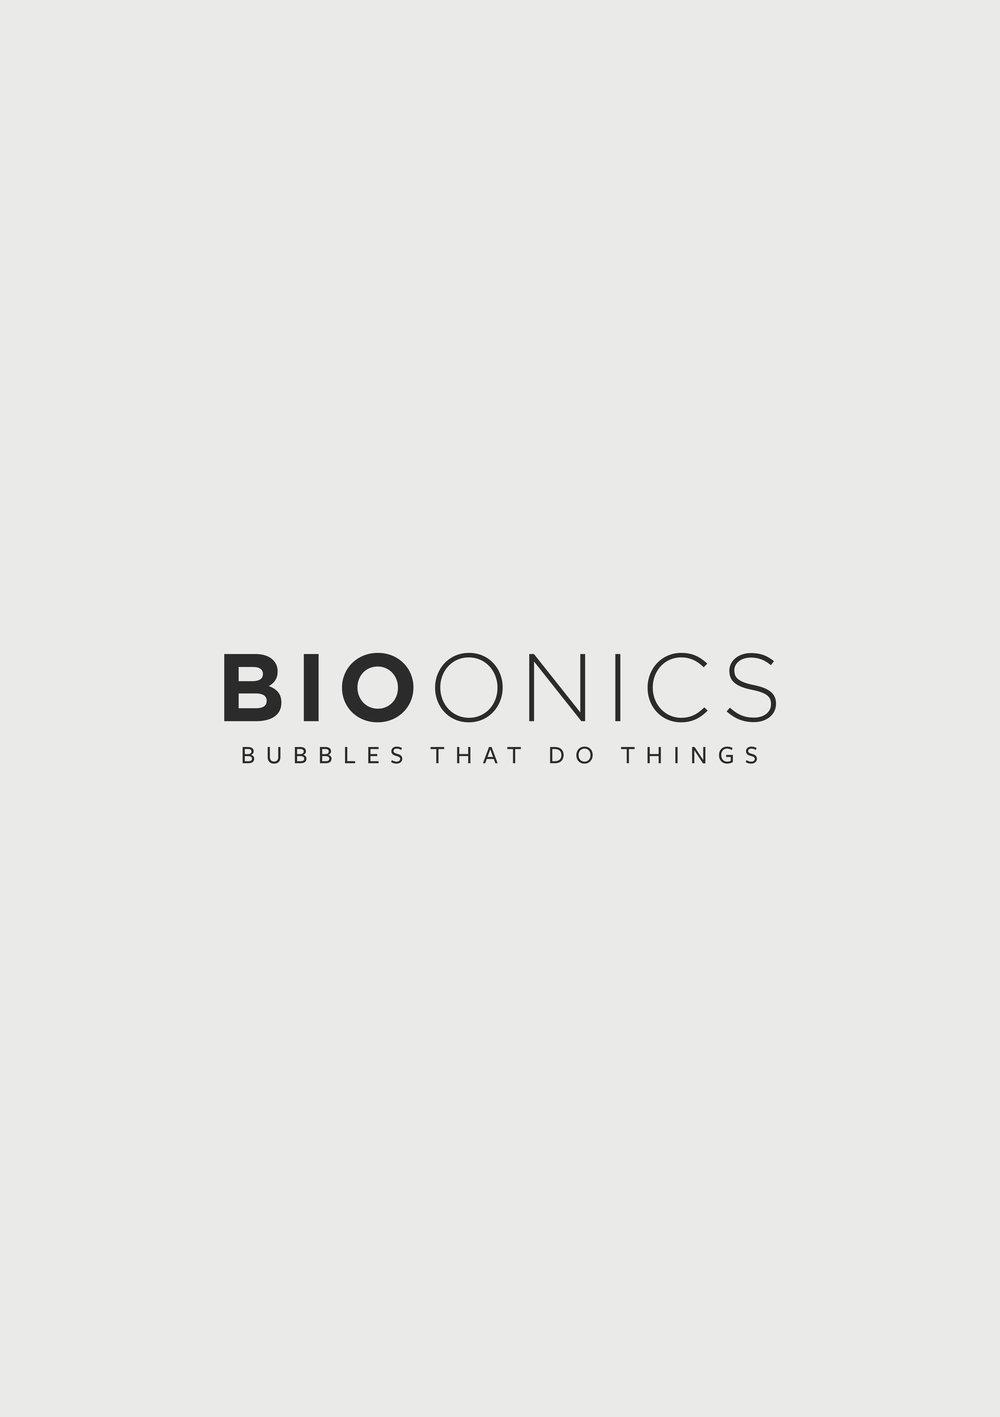 BIOONICS (COMING SOON!)